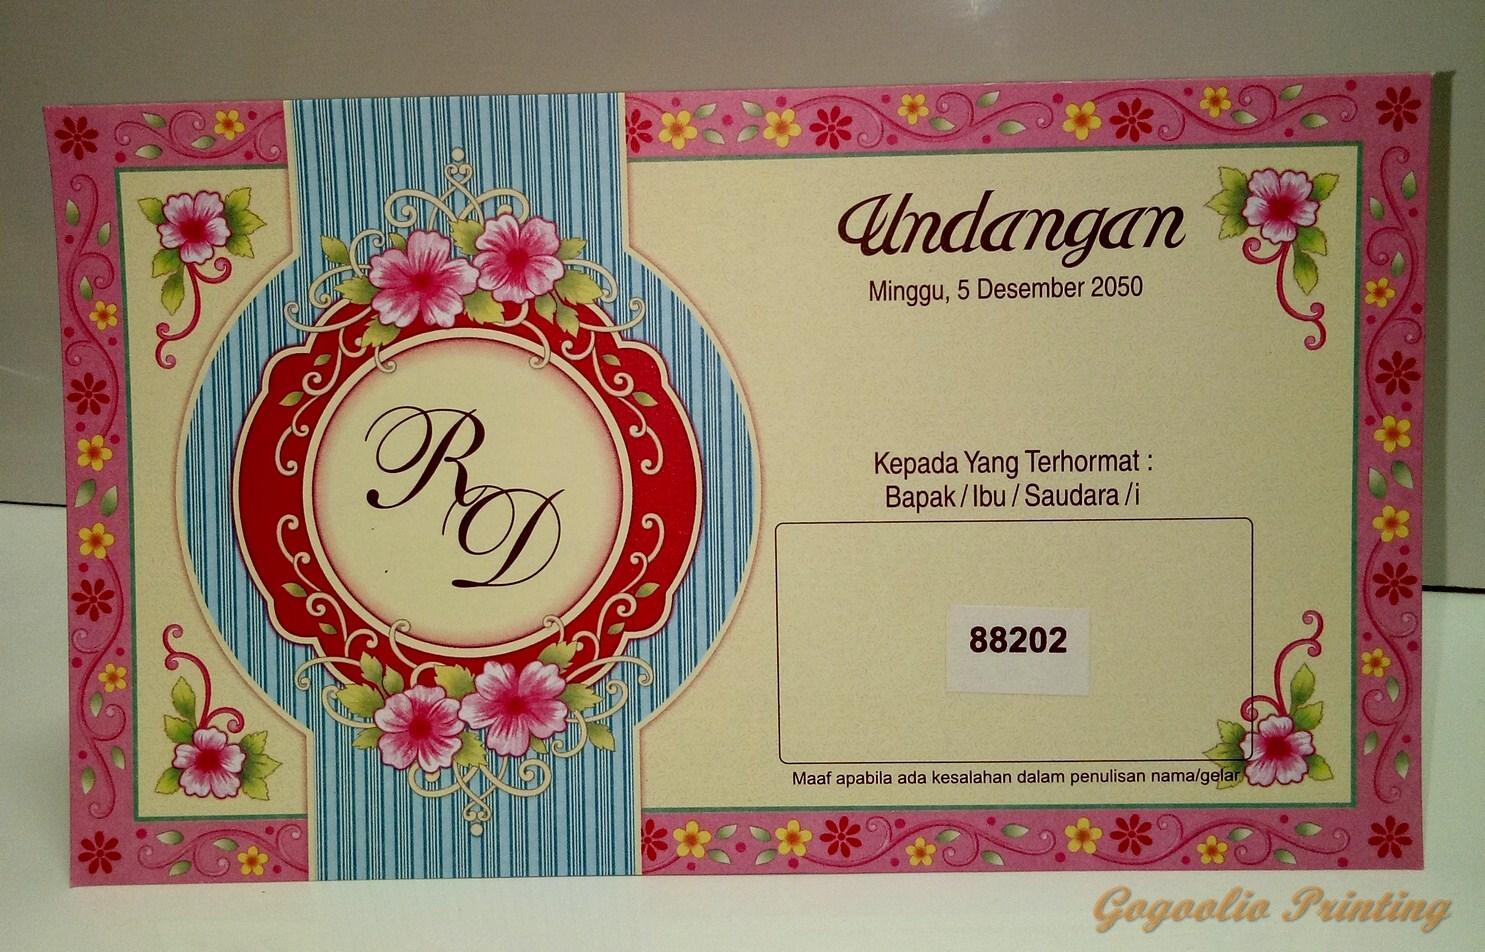 Cetak Undangan Pernikahan Murah 100lembar Sudah Termasuk Cetak Gratis Denah Lokasi Plastik Opp Dan Label Laz88202 By Gogoolio.